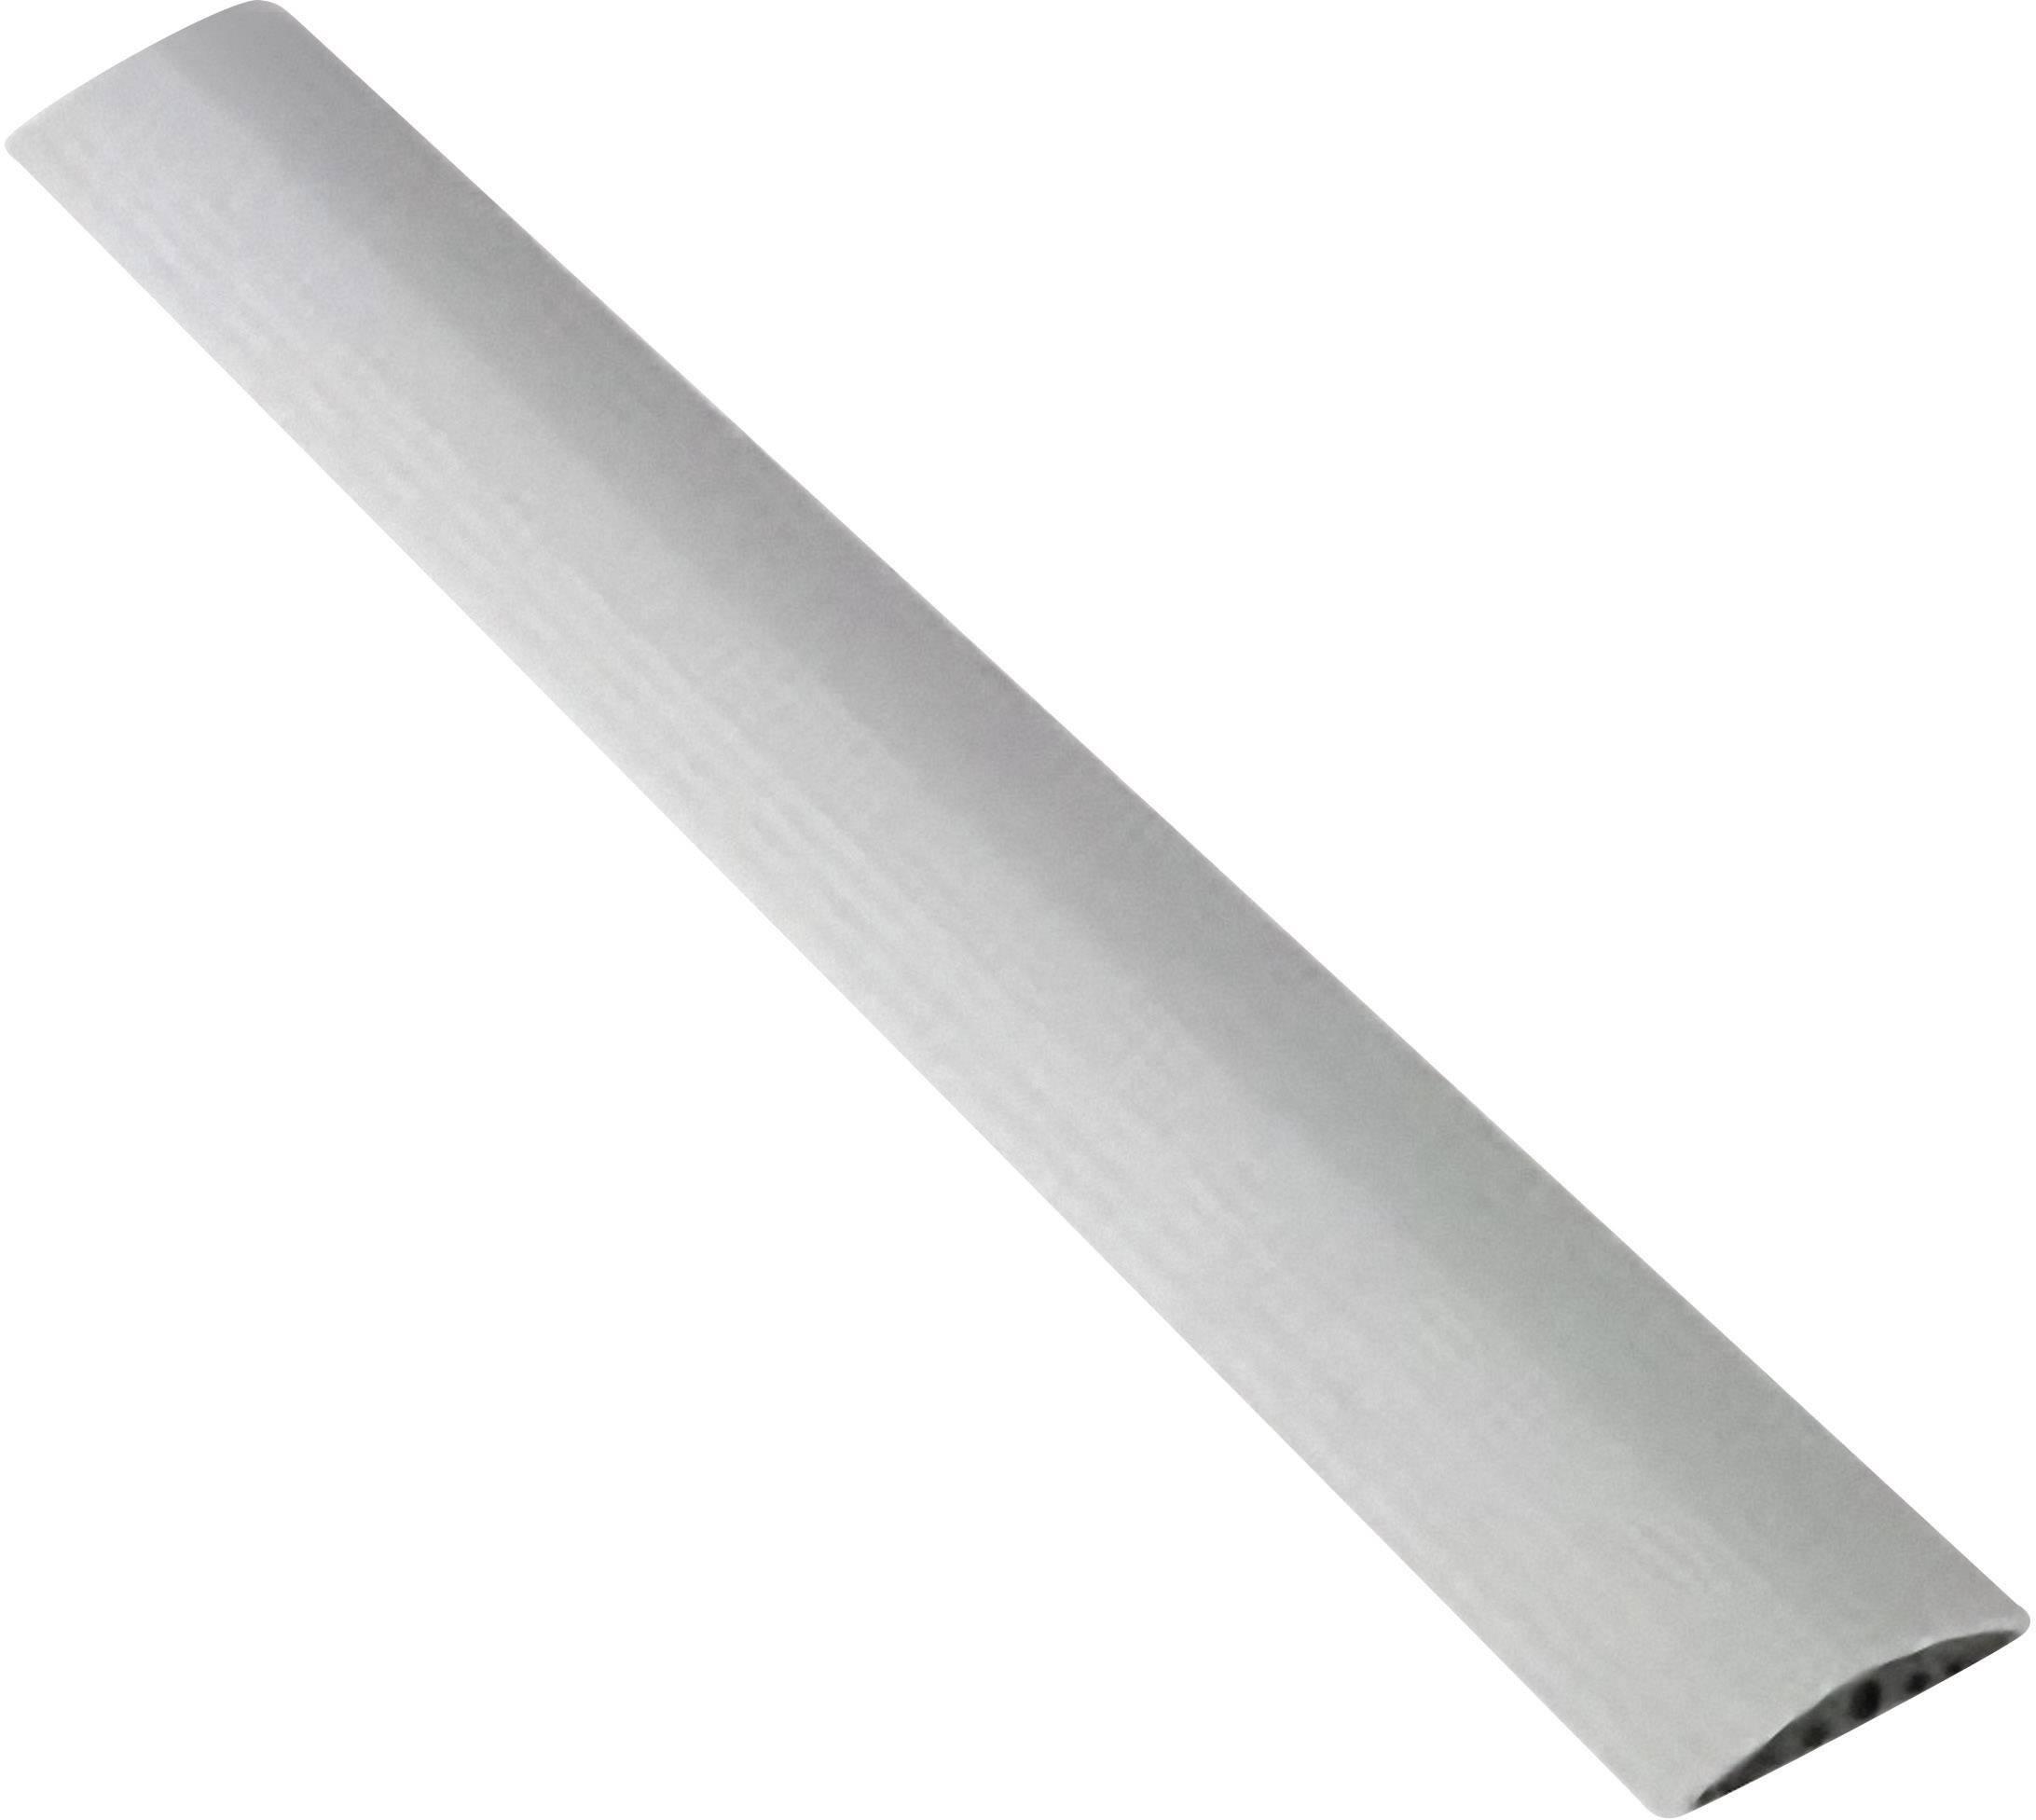 Káblový mostík Serpa 5.01046.7042 B9, (d x š) 3000 mm x 95 mm, svetlosivá, 1 ks